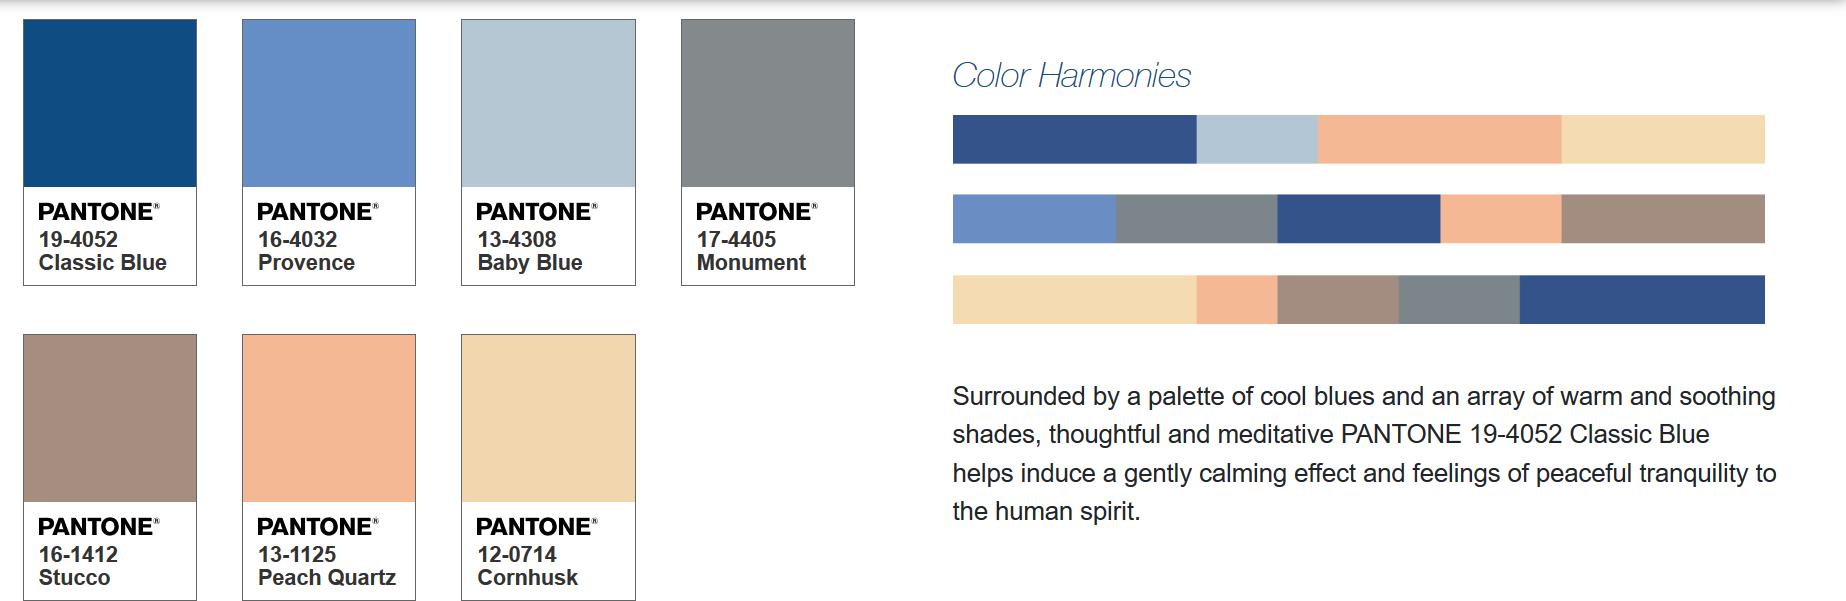 Classic Blue Color Harmonies